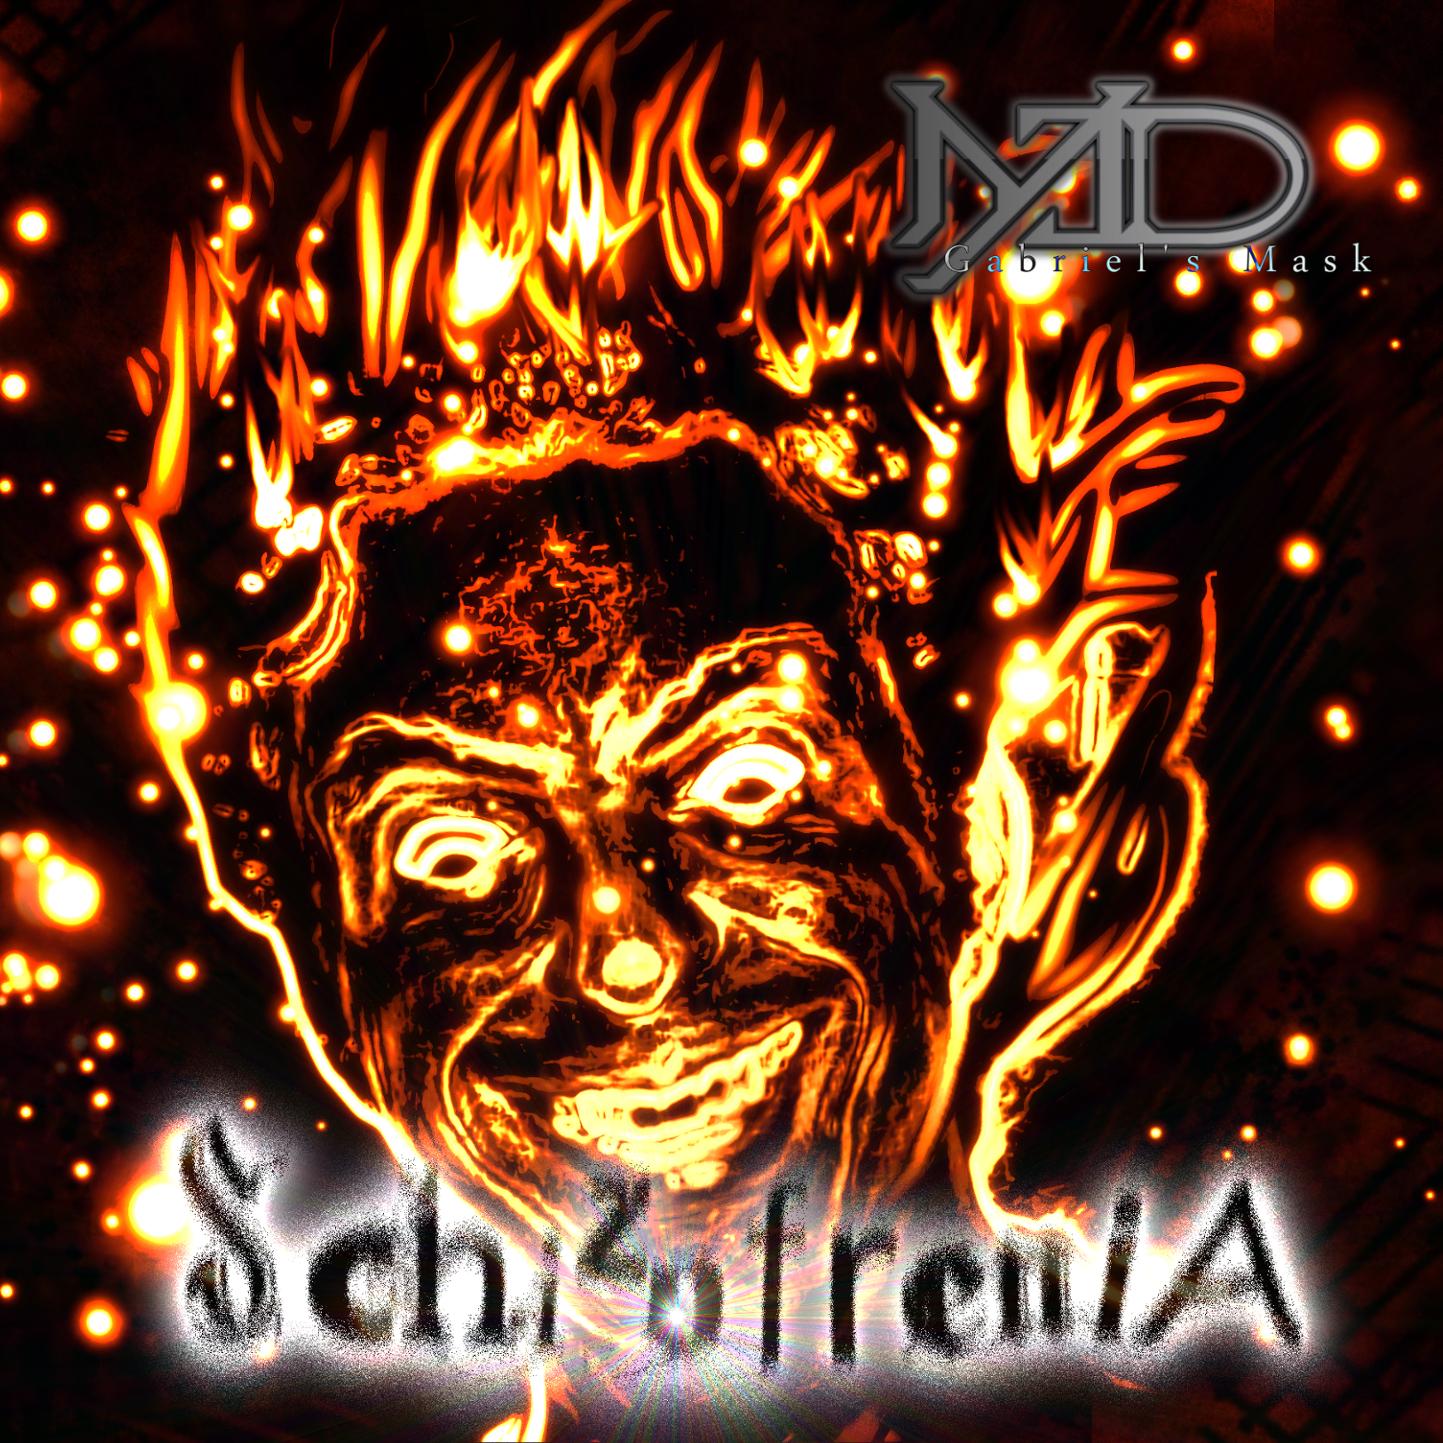 1767969_138610603411_SchizofreniA-cover.jpg